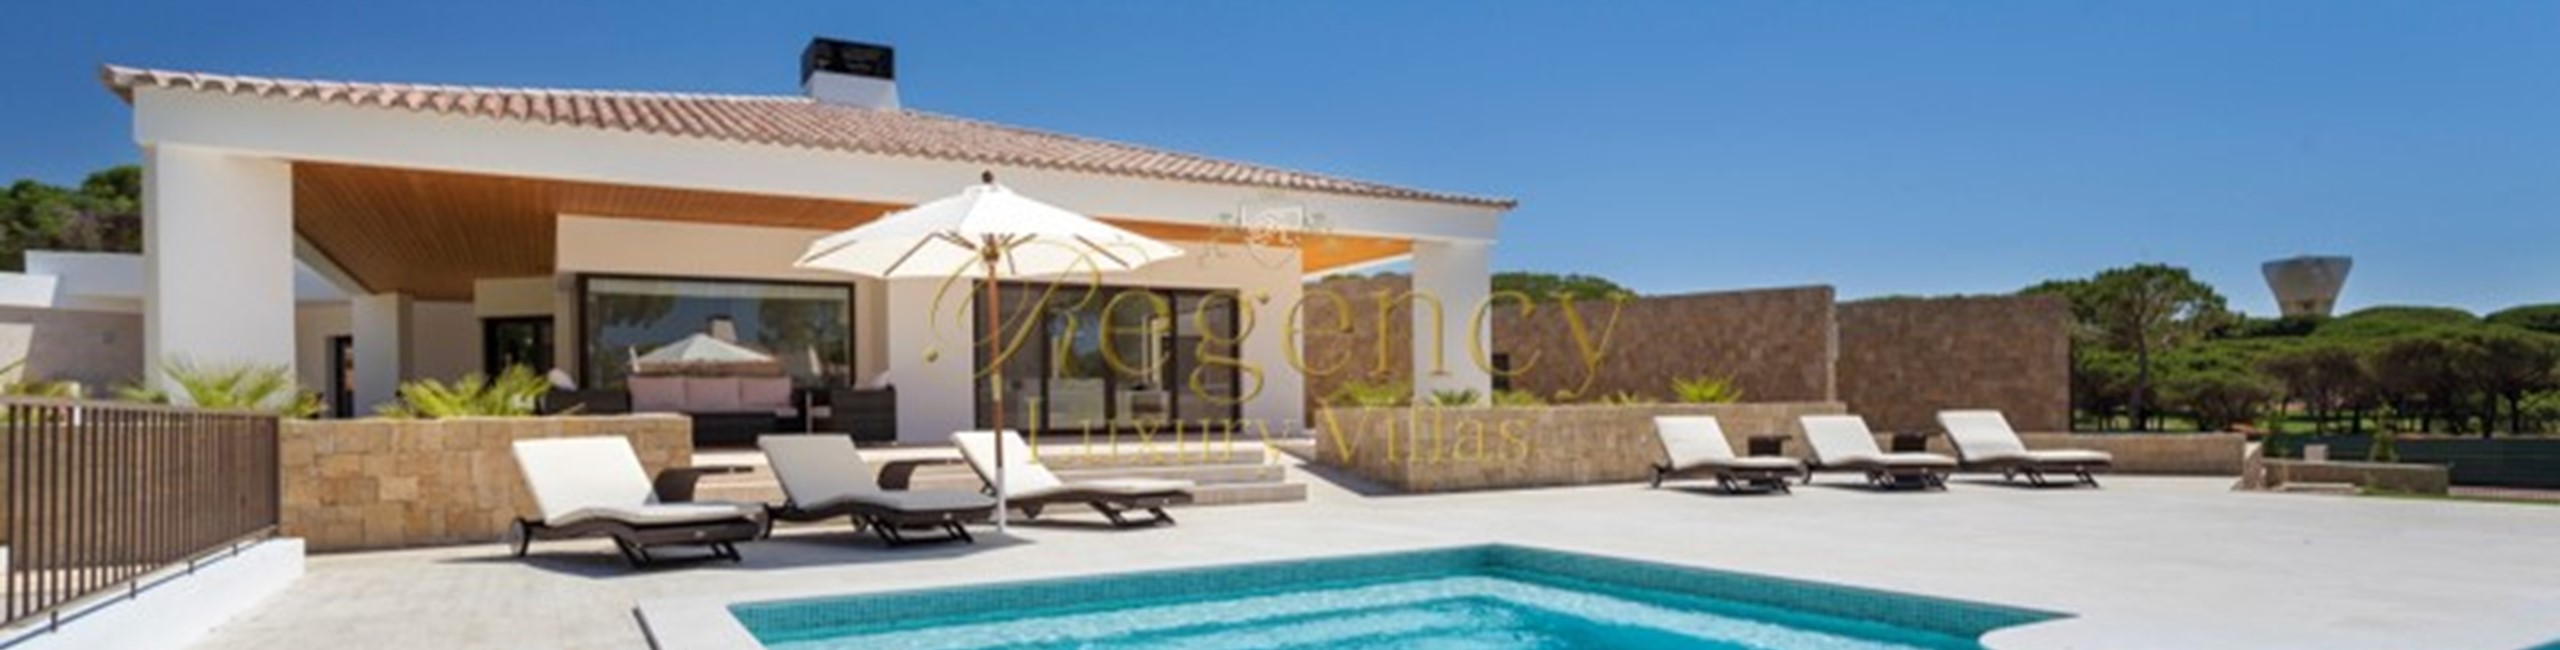 5 Bedroom Villa To Rent In Vilamoura Villa Turquoise Regency Luxury Villas 32